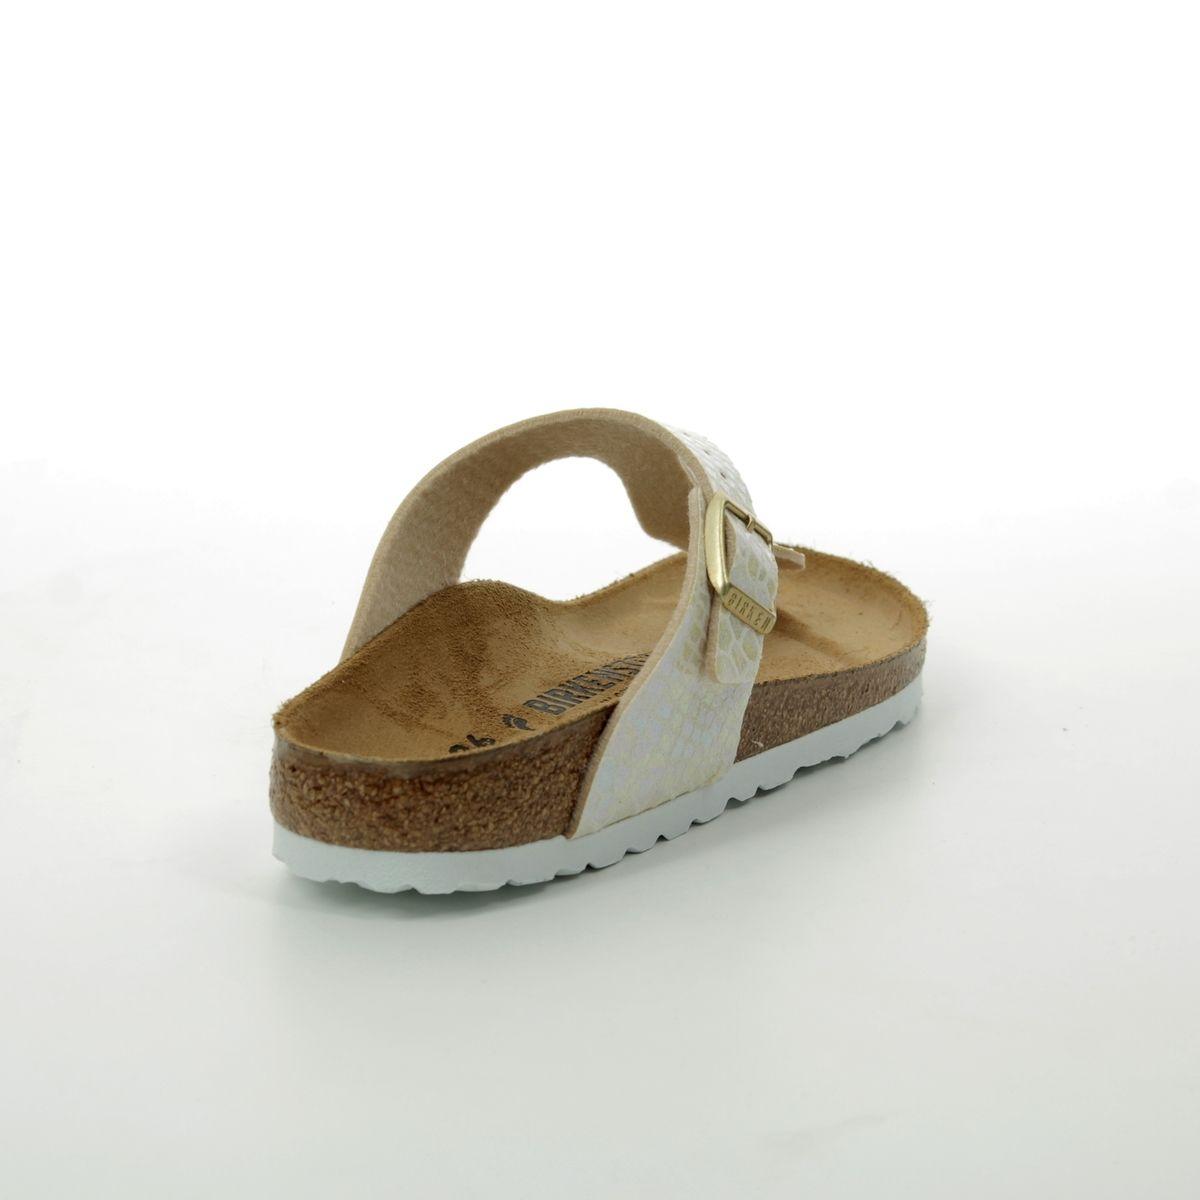 fb35be07972 Birkenstock Toe Post Sandals - Beige - 0847433 GIZEH SHINY SNAKE CREAM